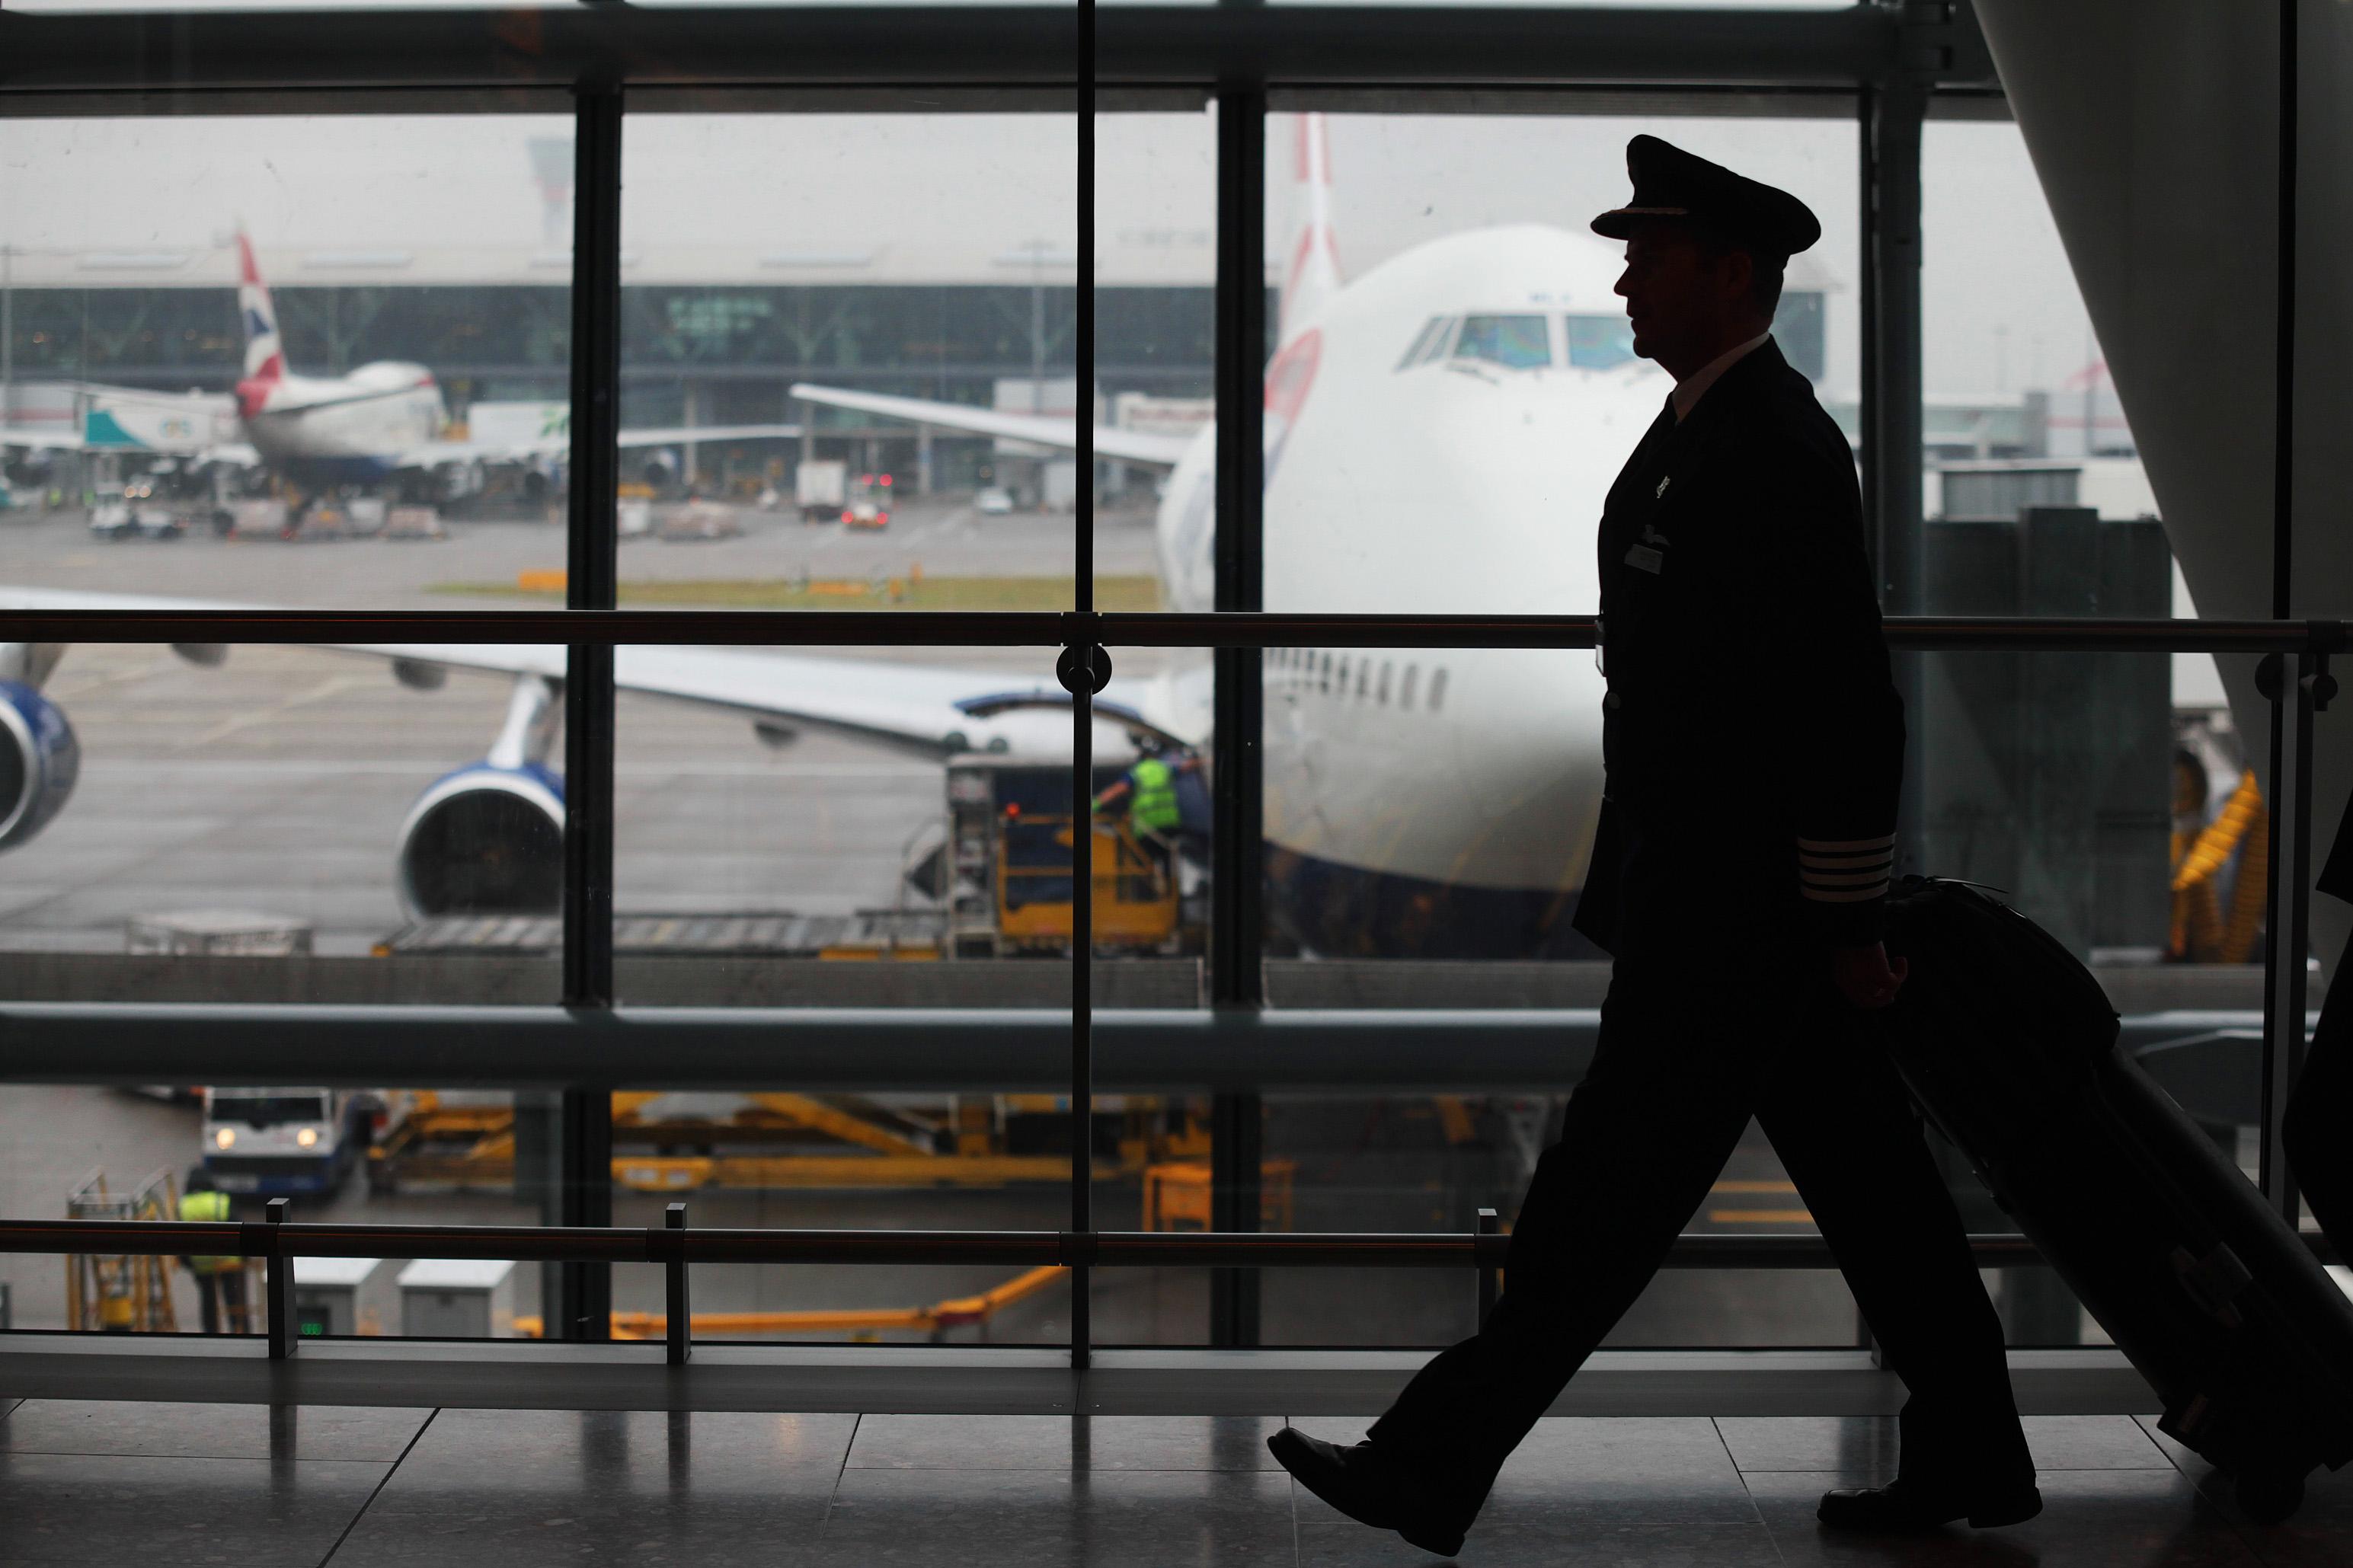 British Airways opens 2018 cadet pilot programme - Pilot